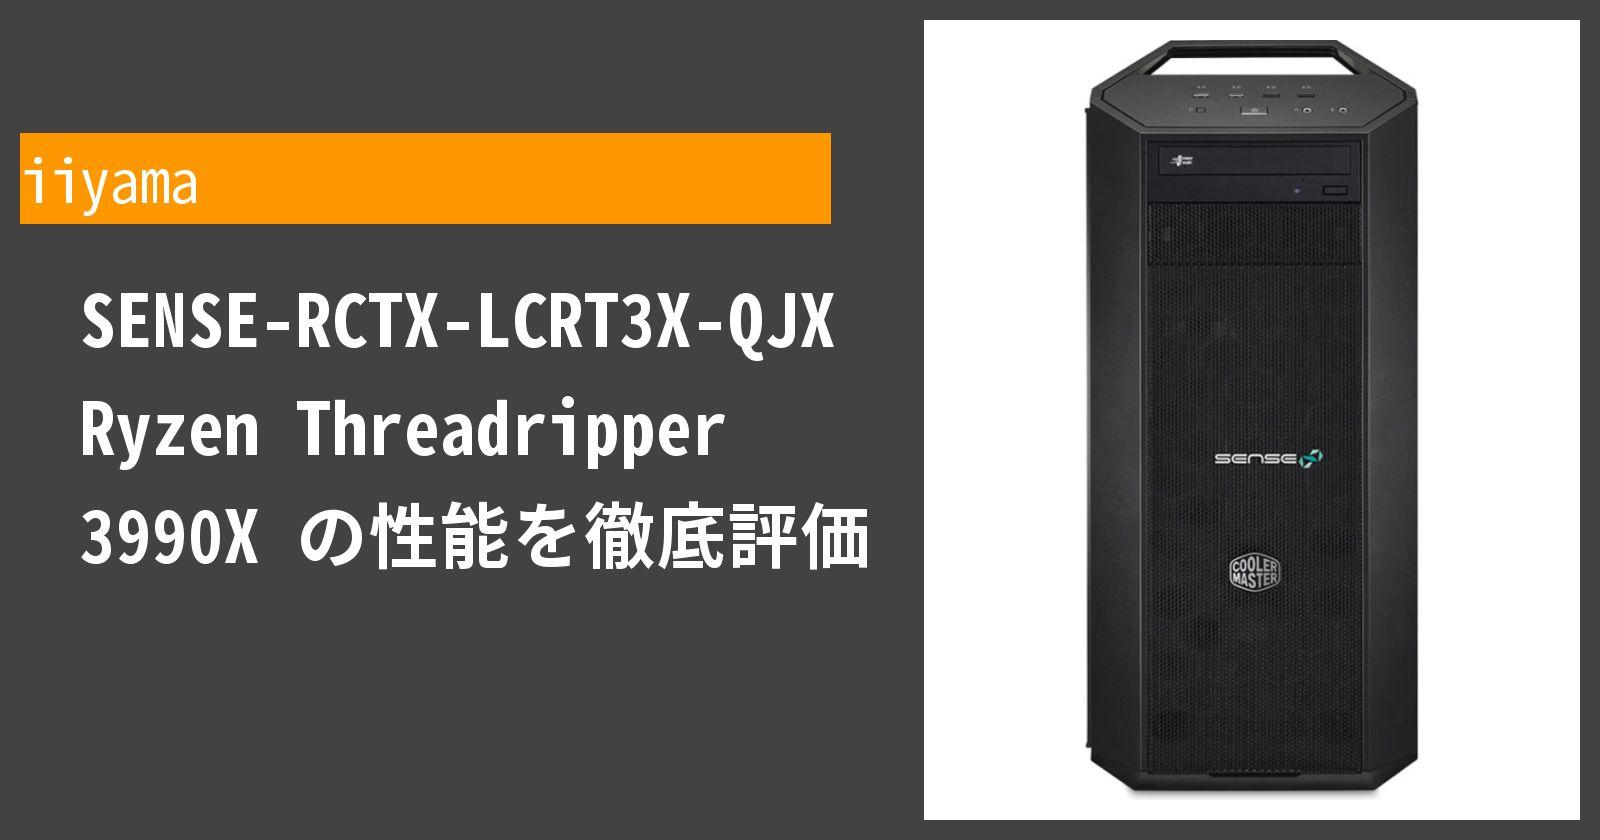 SENSE-RCTX-LCRT3X-QJX Ryzen Threadripper 3990X の性能を徹底評価